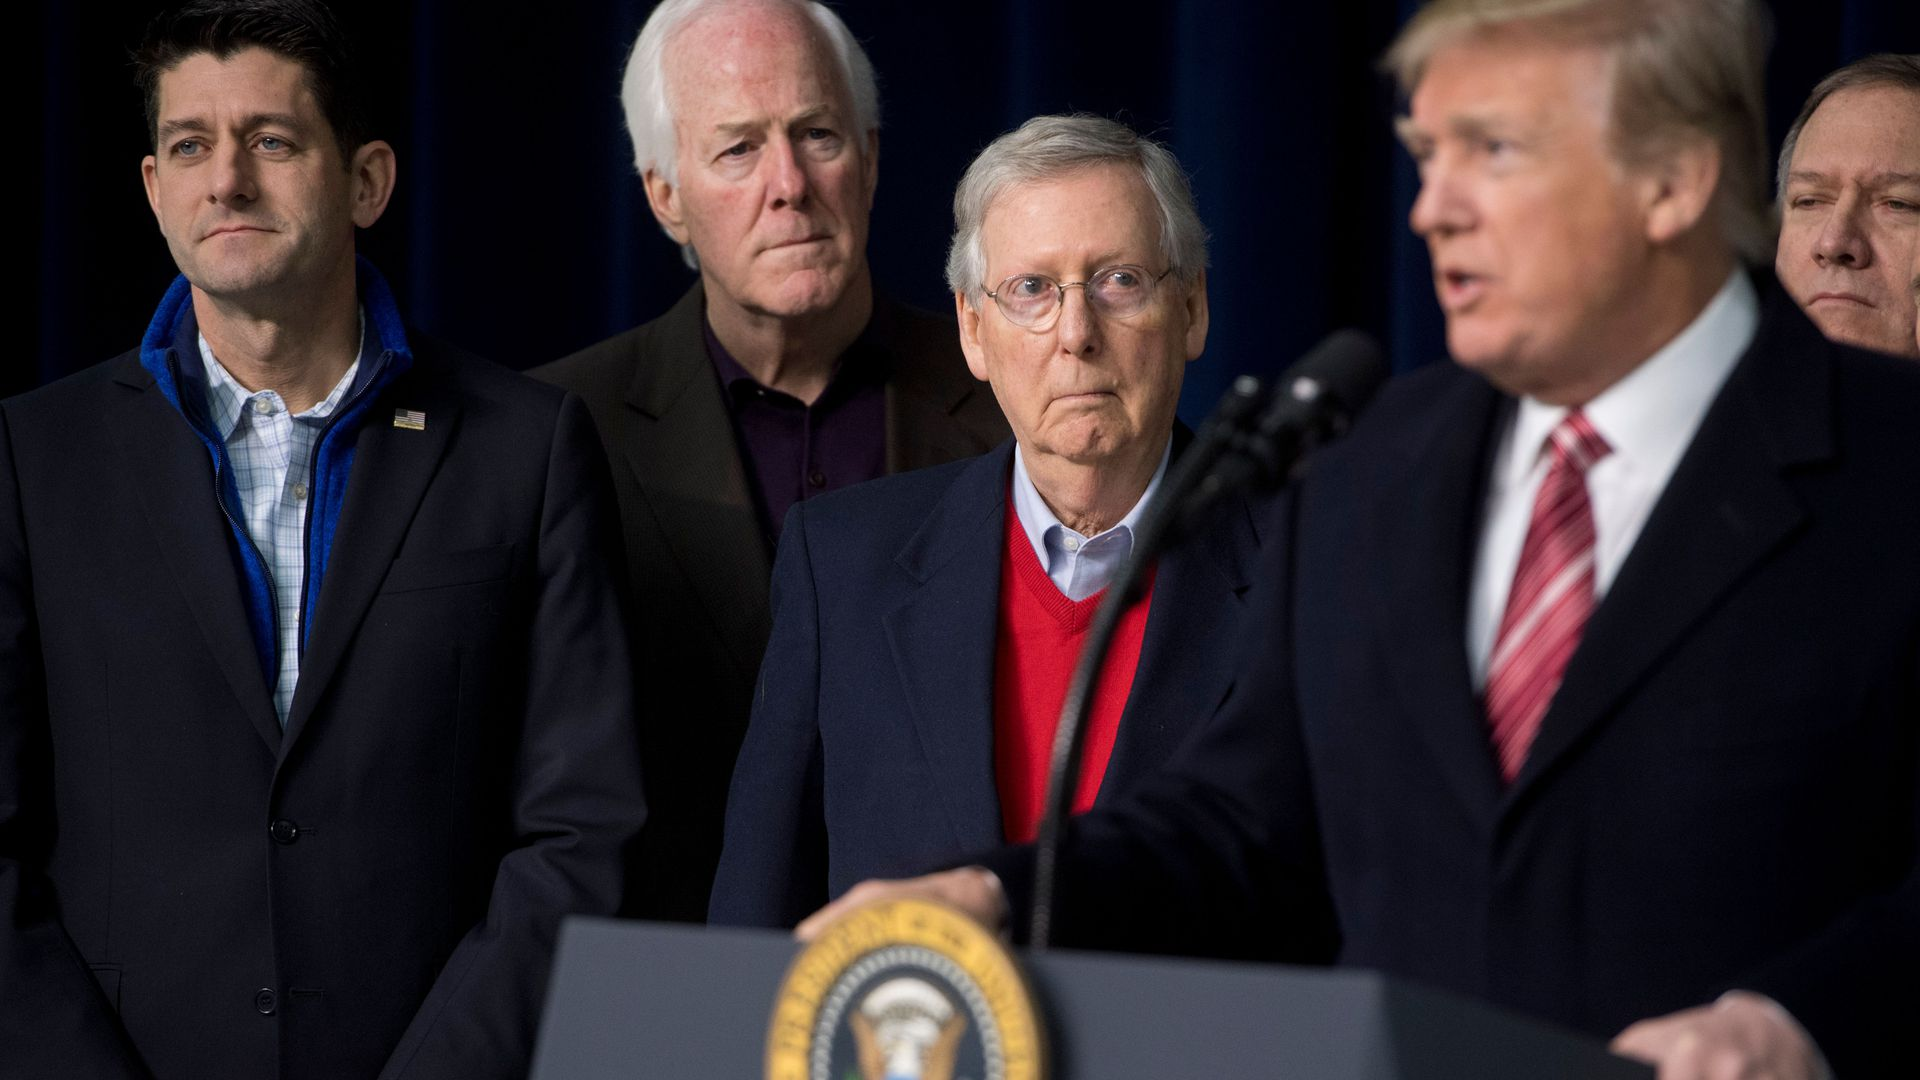 McConnell, Ryan, Cornyn, Trump